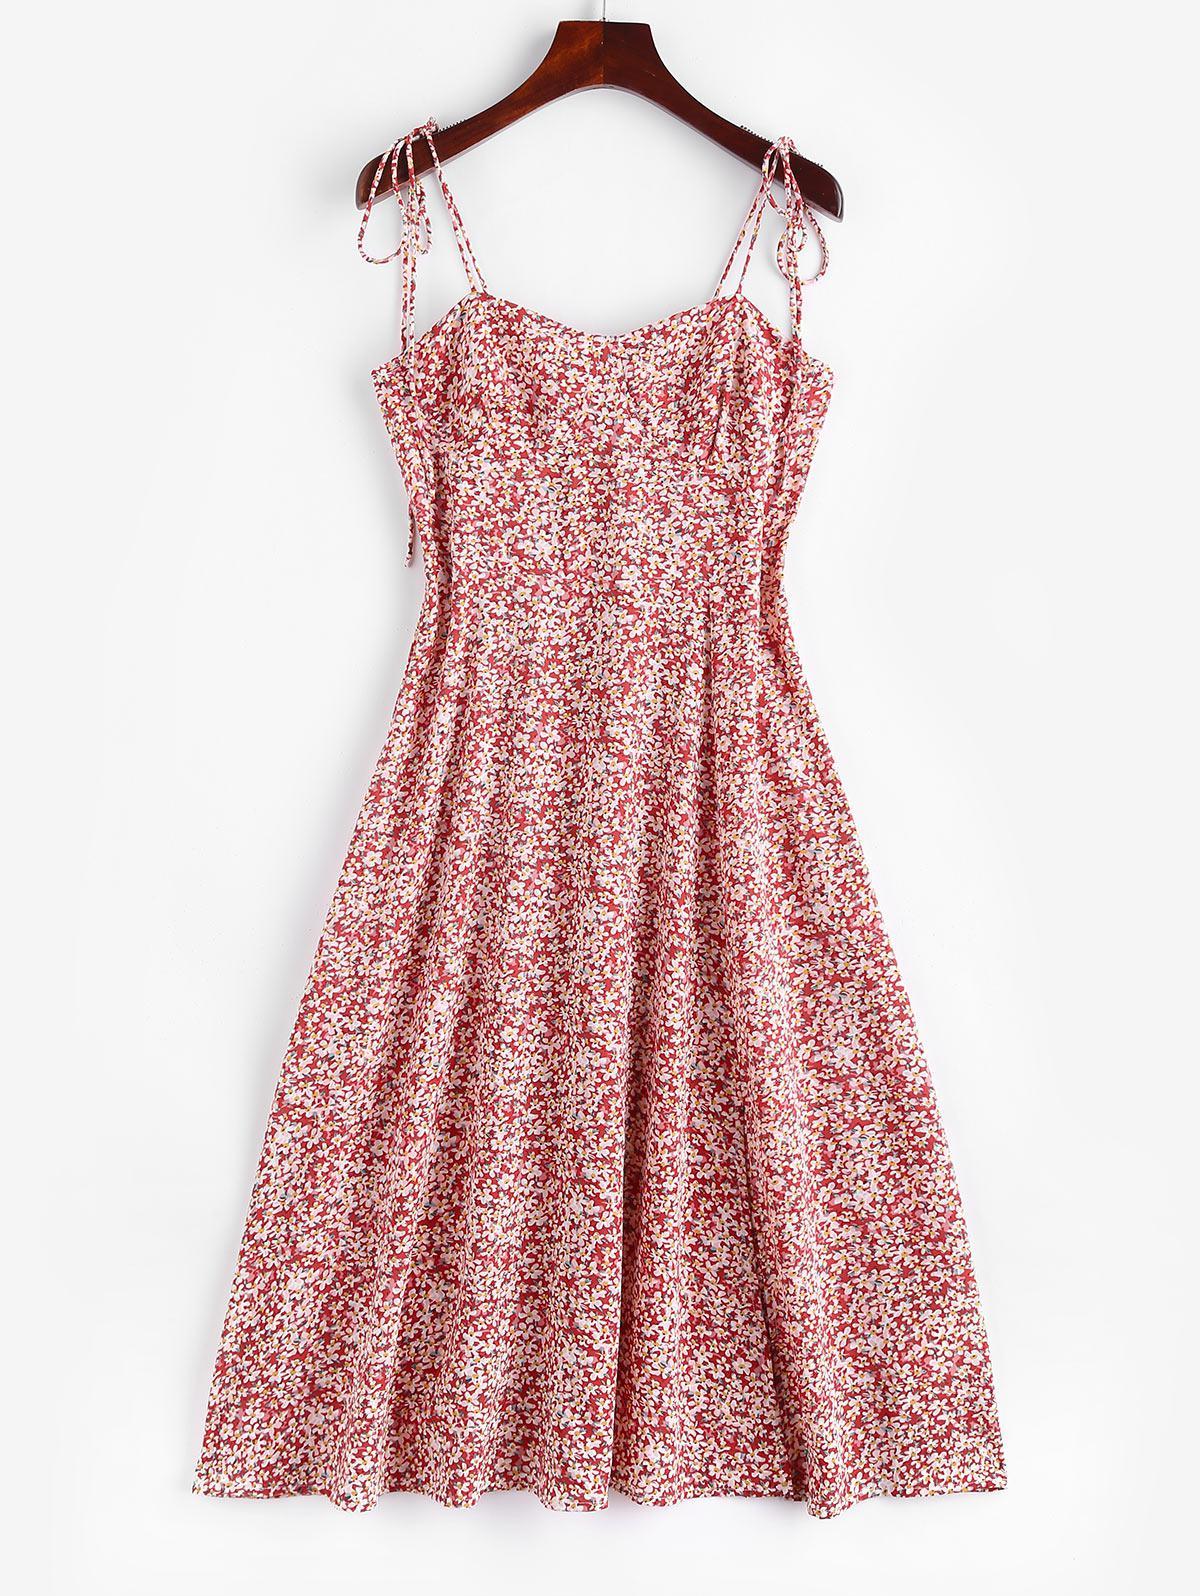 Zaful Tiny Floral Tie Shoulder Slit Midi Dress